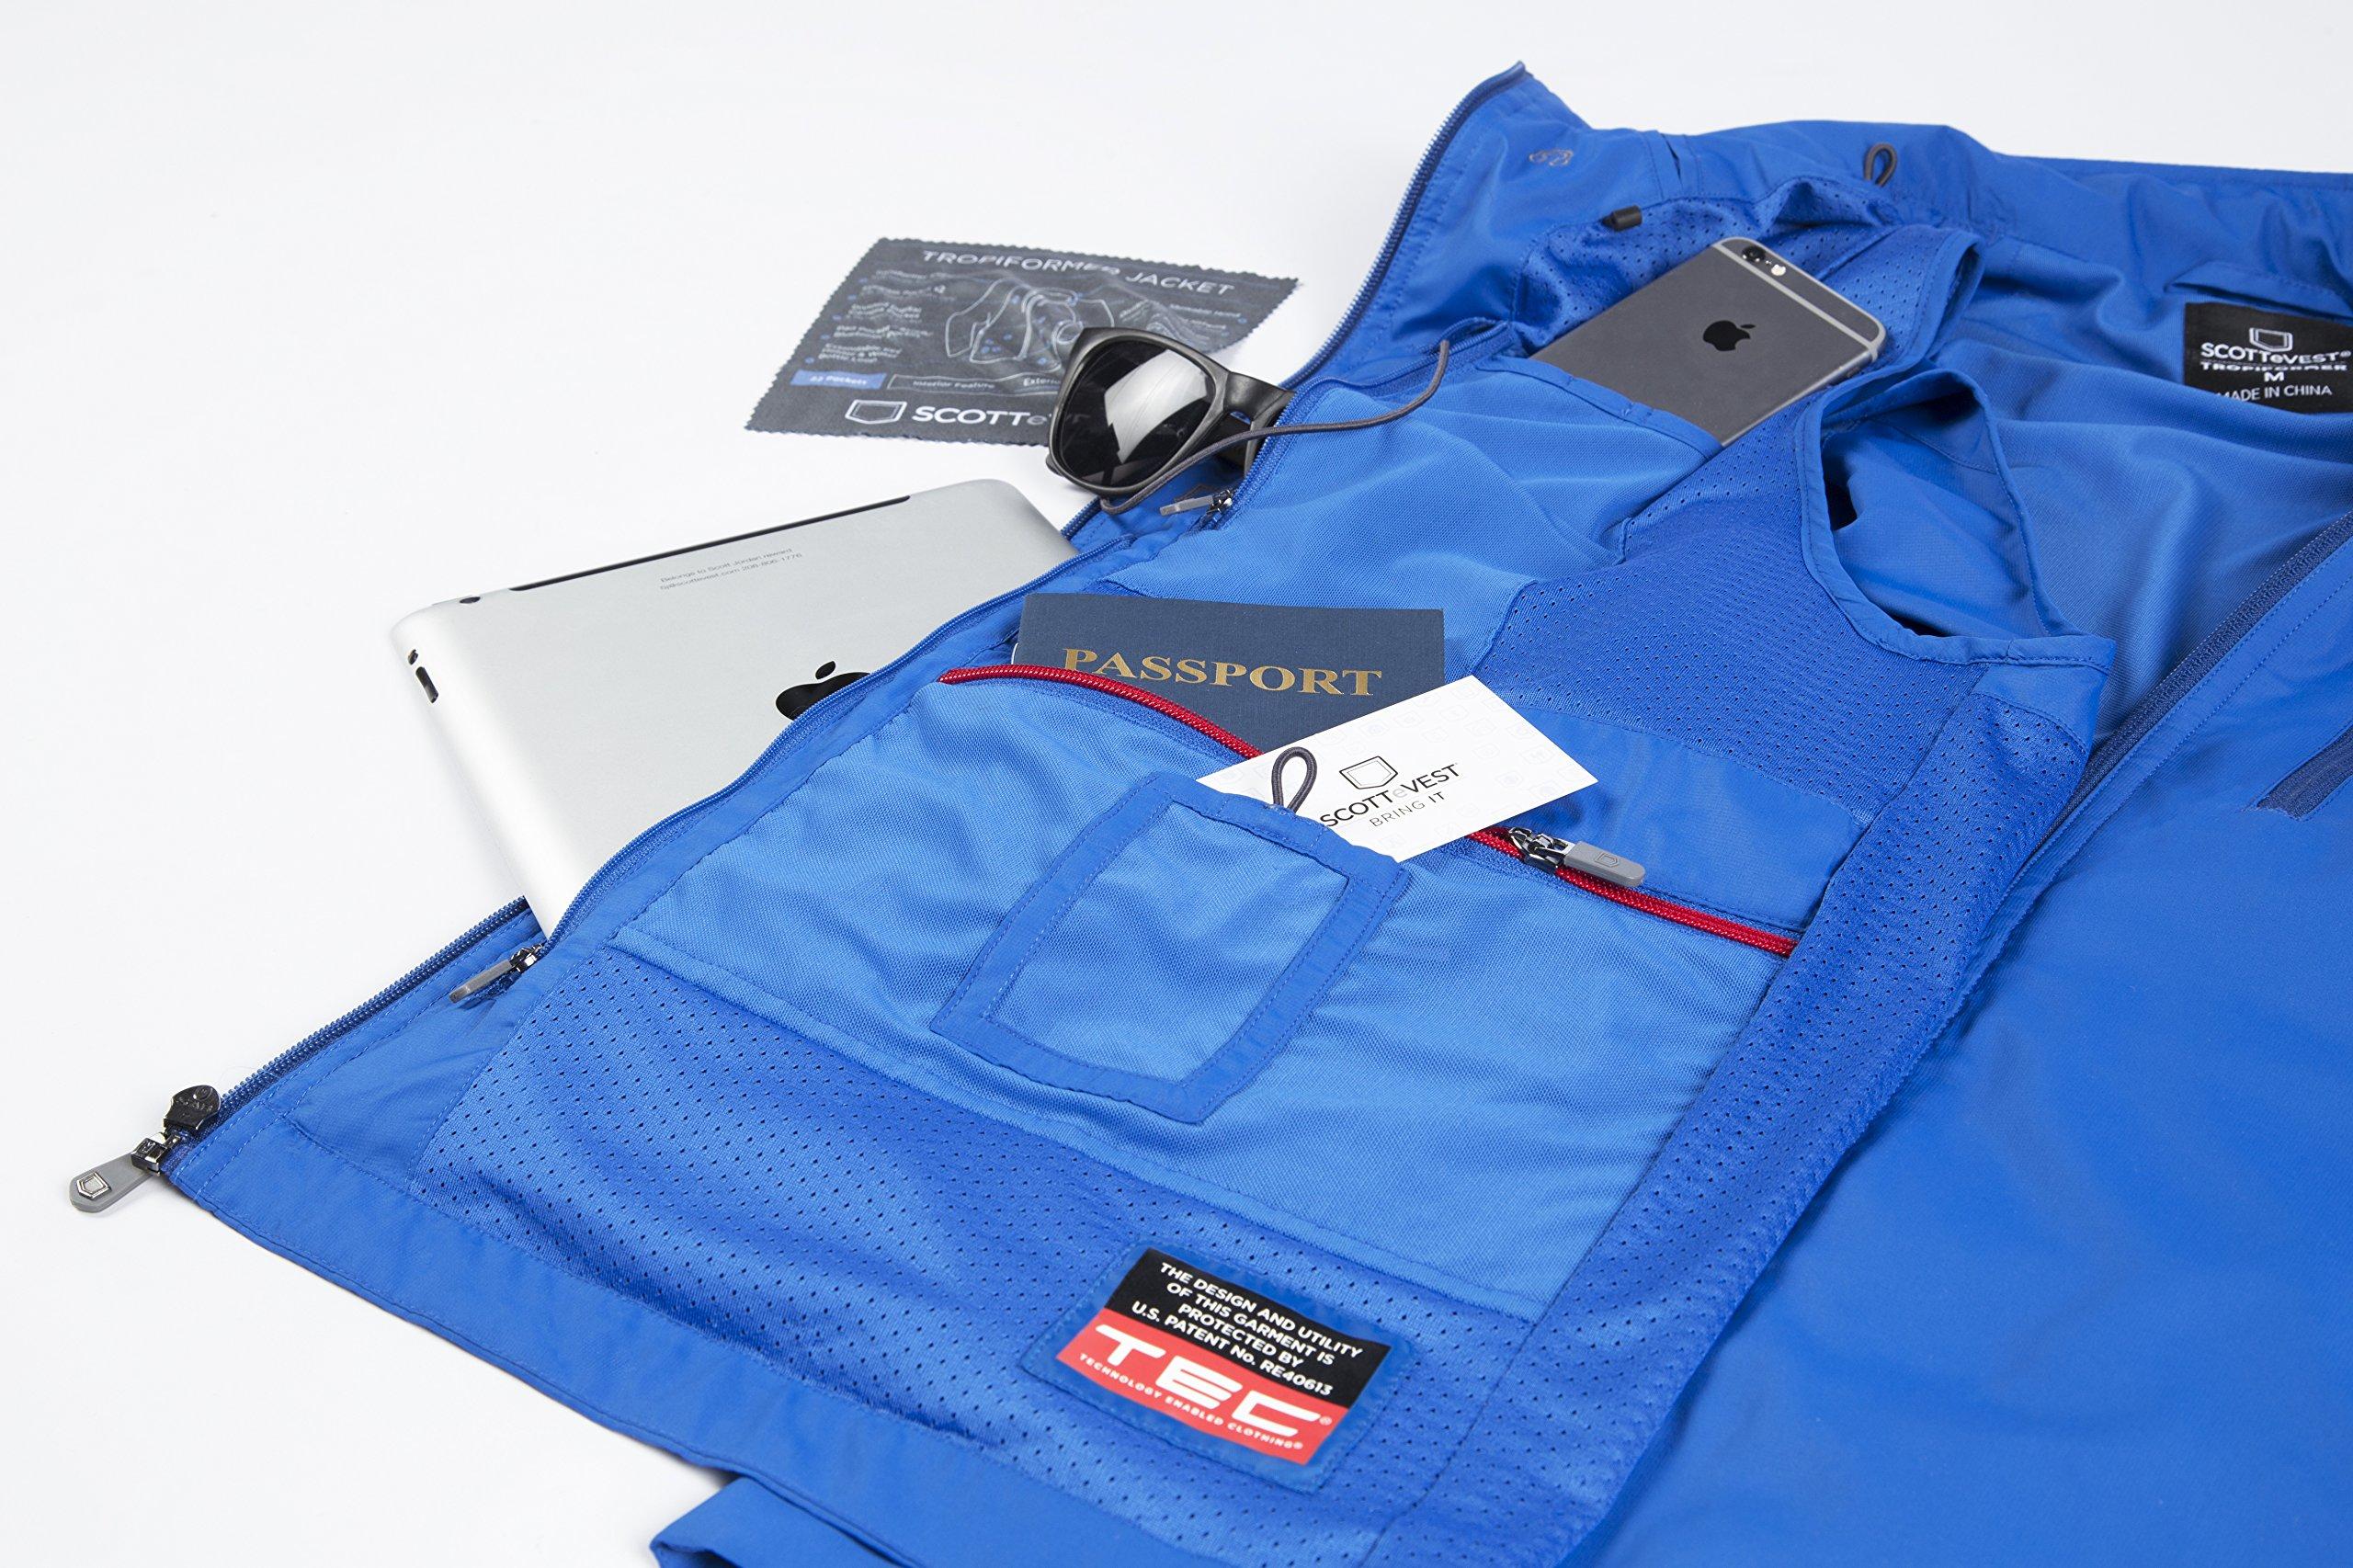 SCOTTeVEST Tropiformer Jacket - 22 Pockets – Convertible, Travel Clothing RED L by SCOTTeVEST (Image #4)